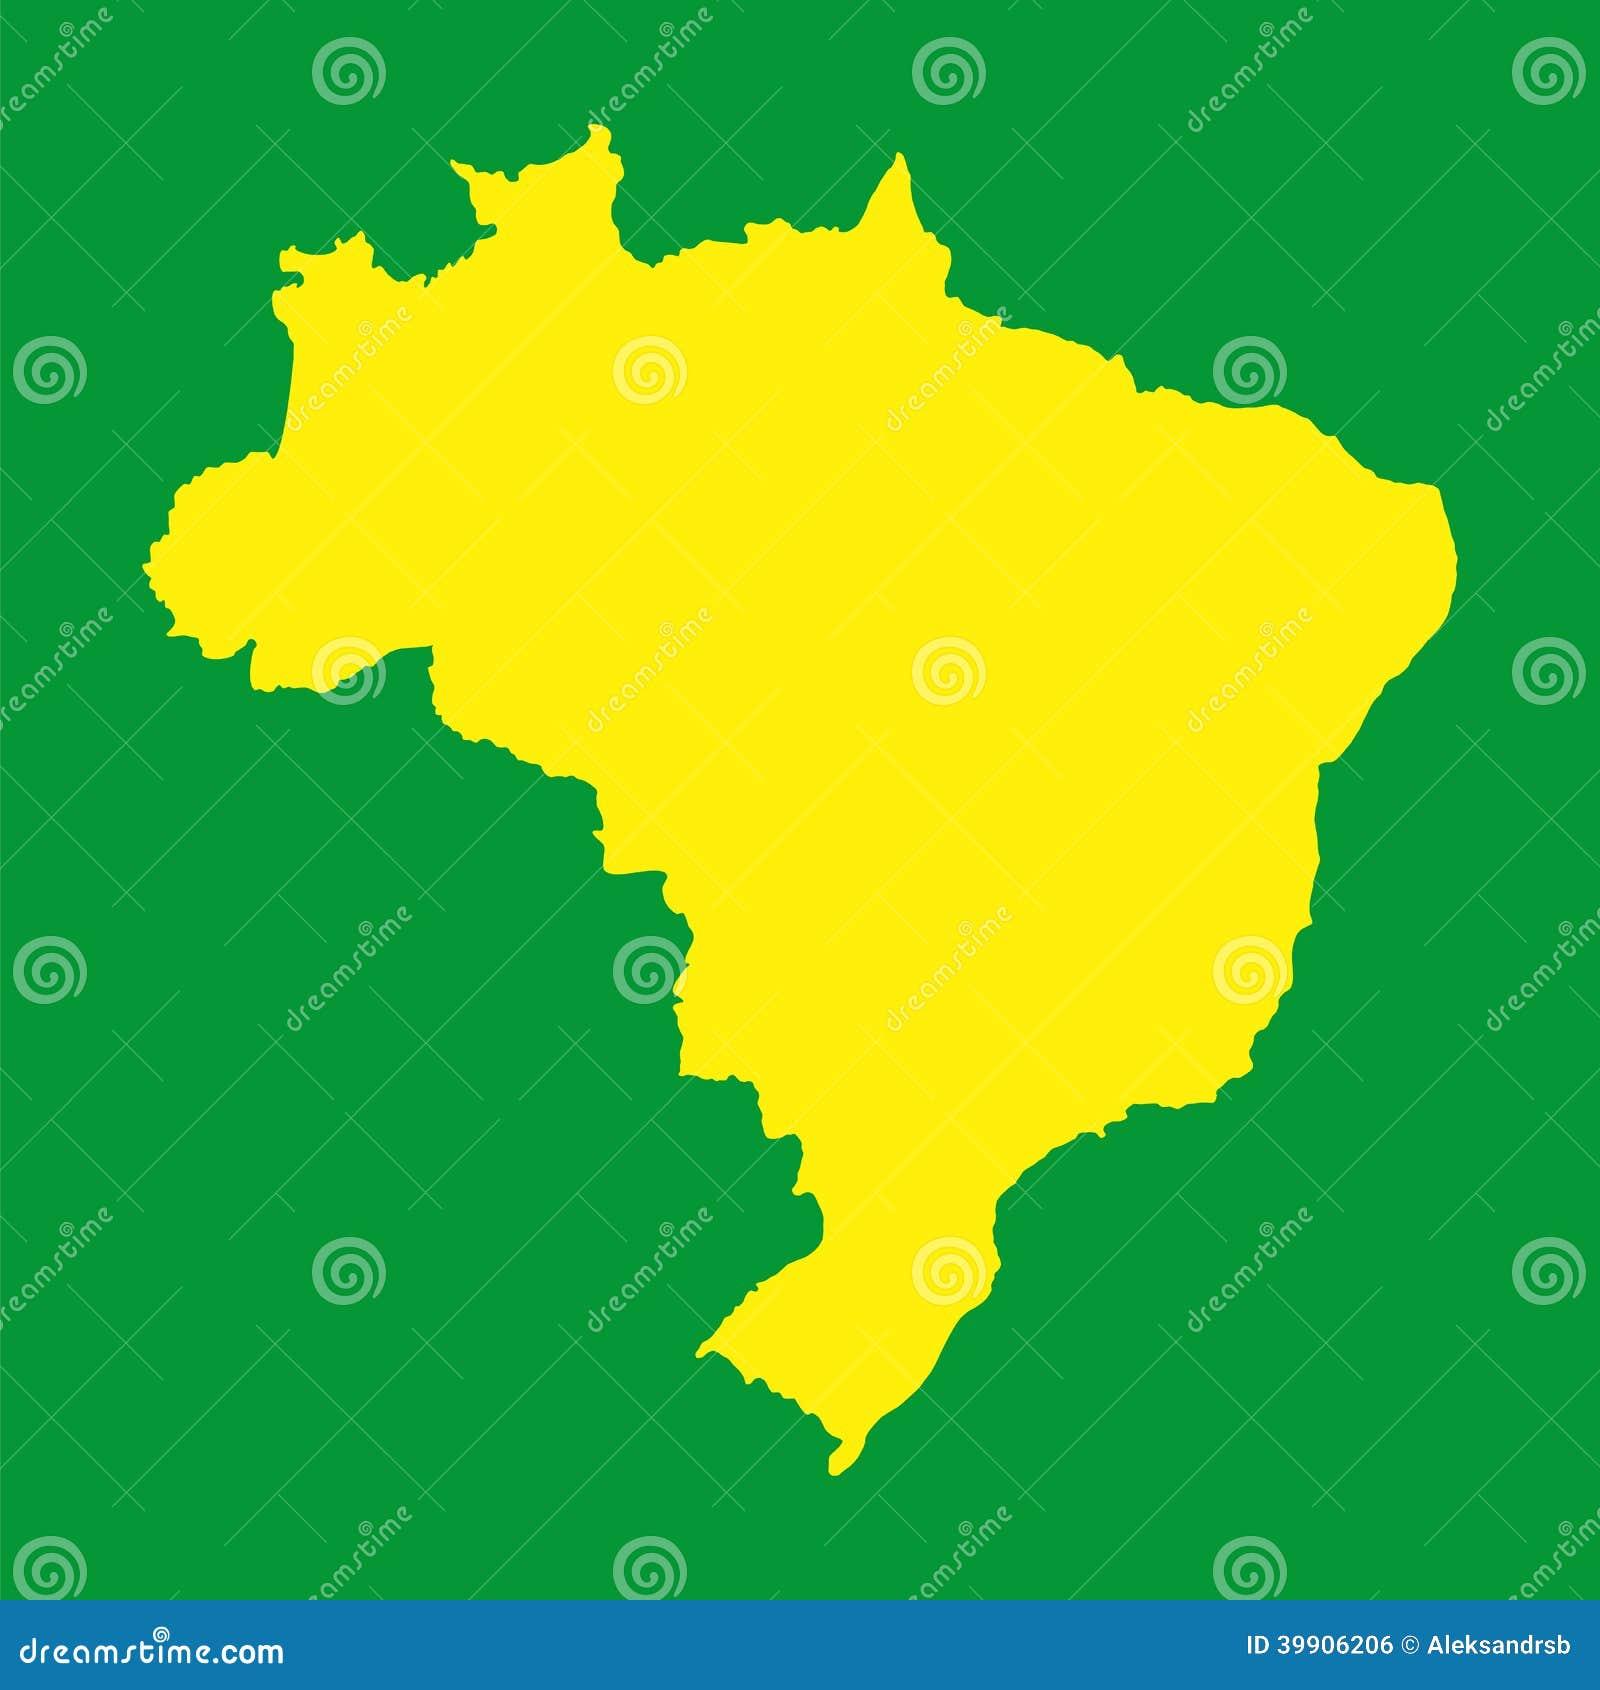 Brazil Map Background For Your Presentations Stock Vector Image - Brazil map illustration